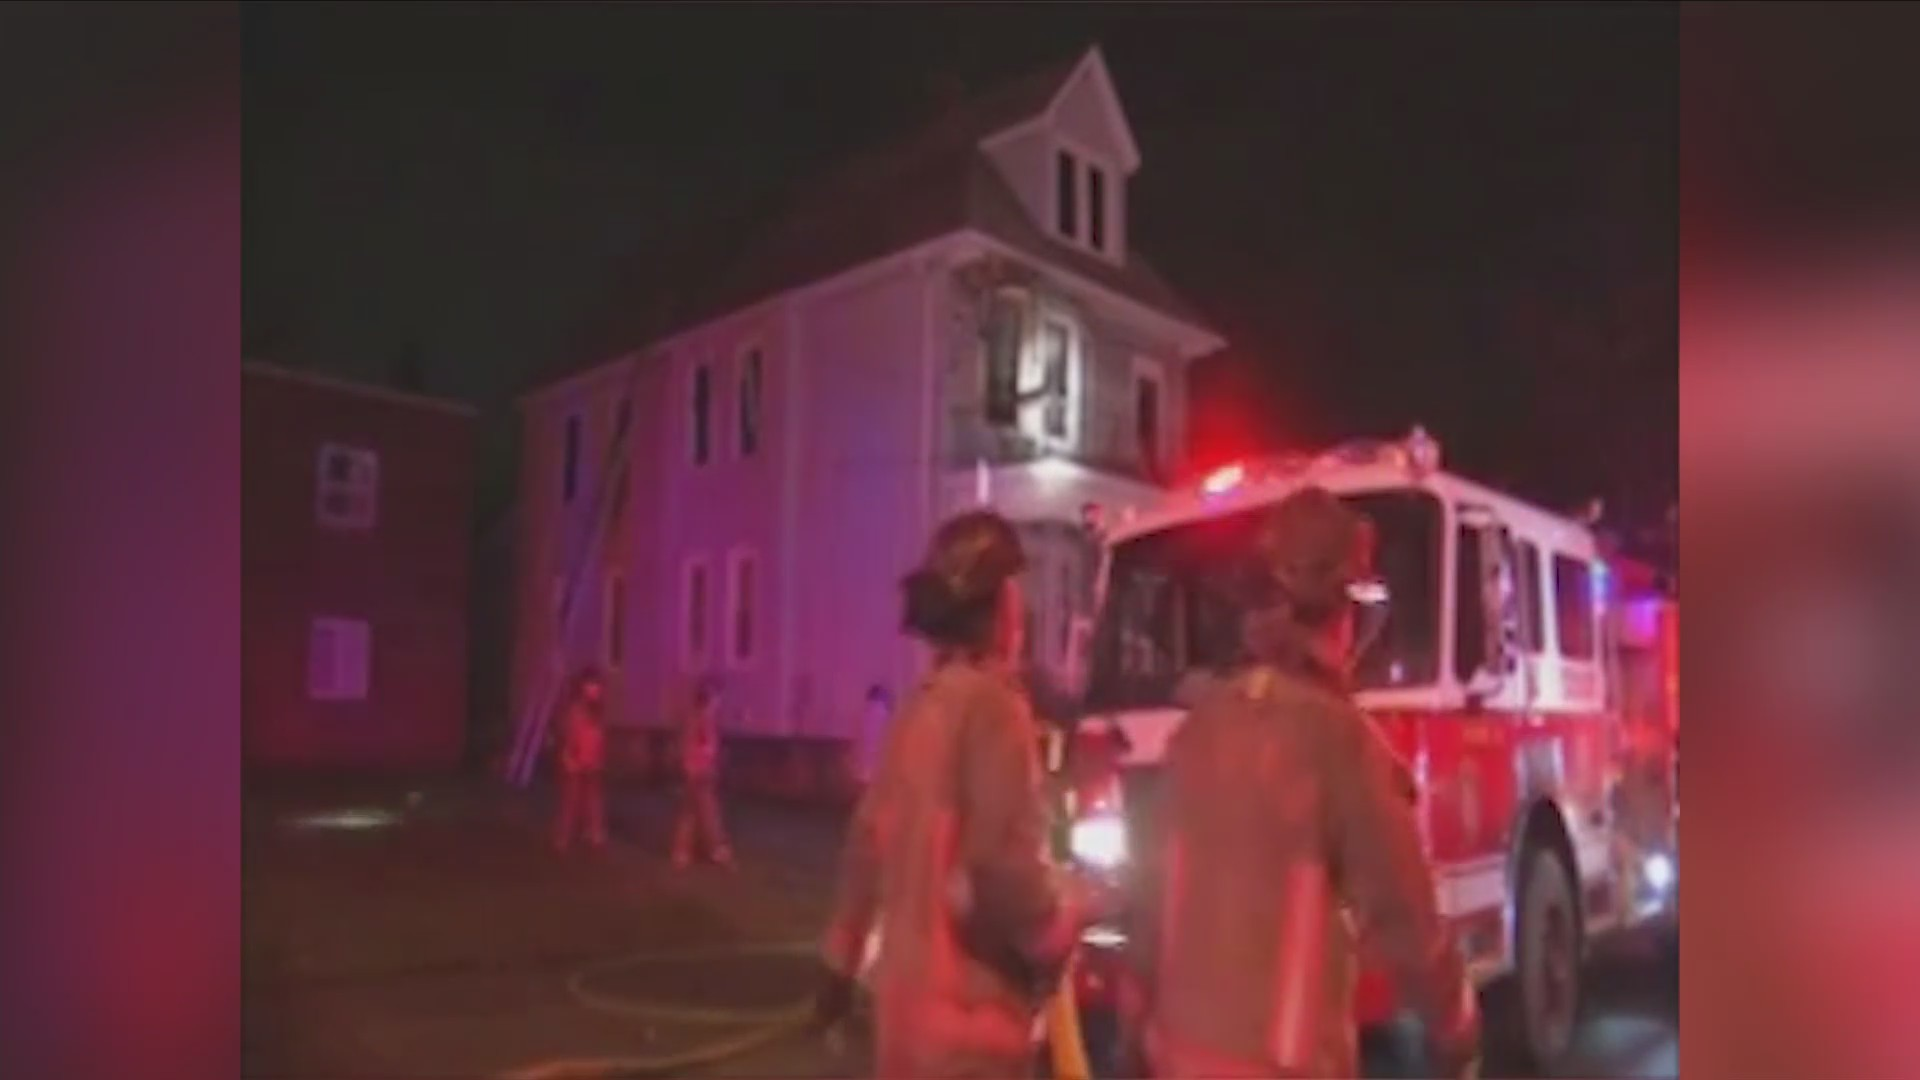 Buffalo firefighters 24 hr shift